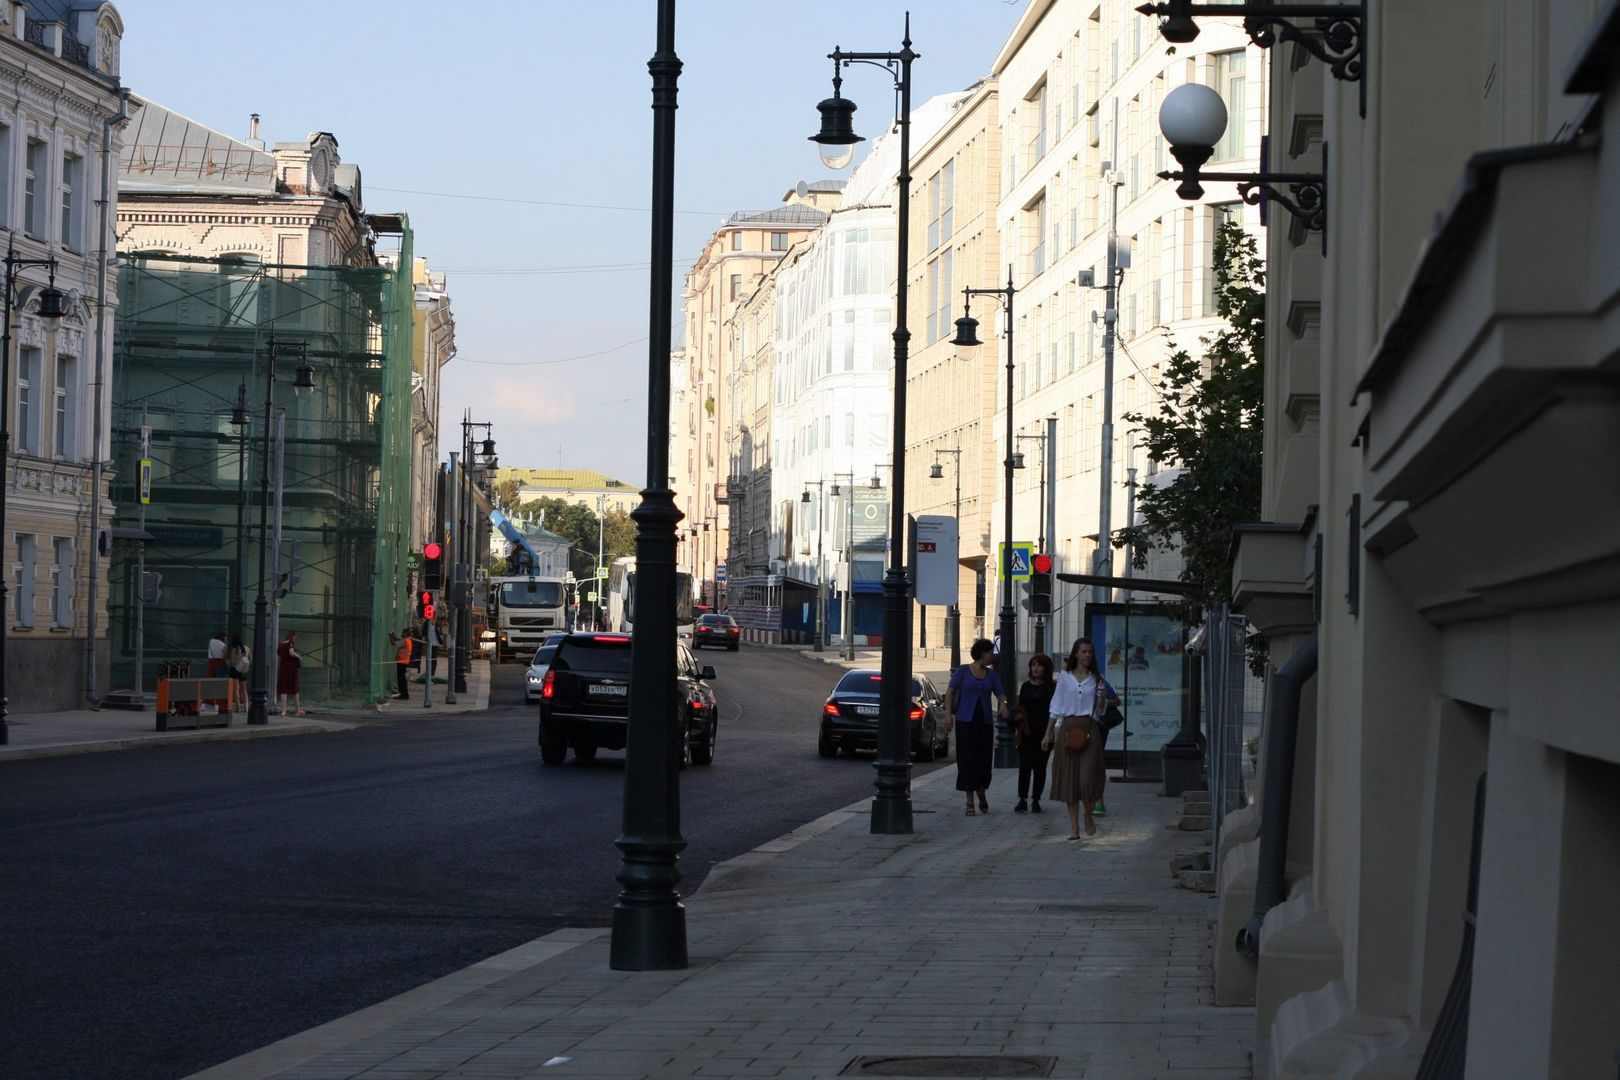 улица Остоженка, ремонт дорог, асфальт, плитка, фонари